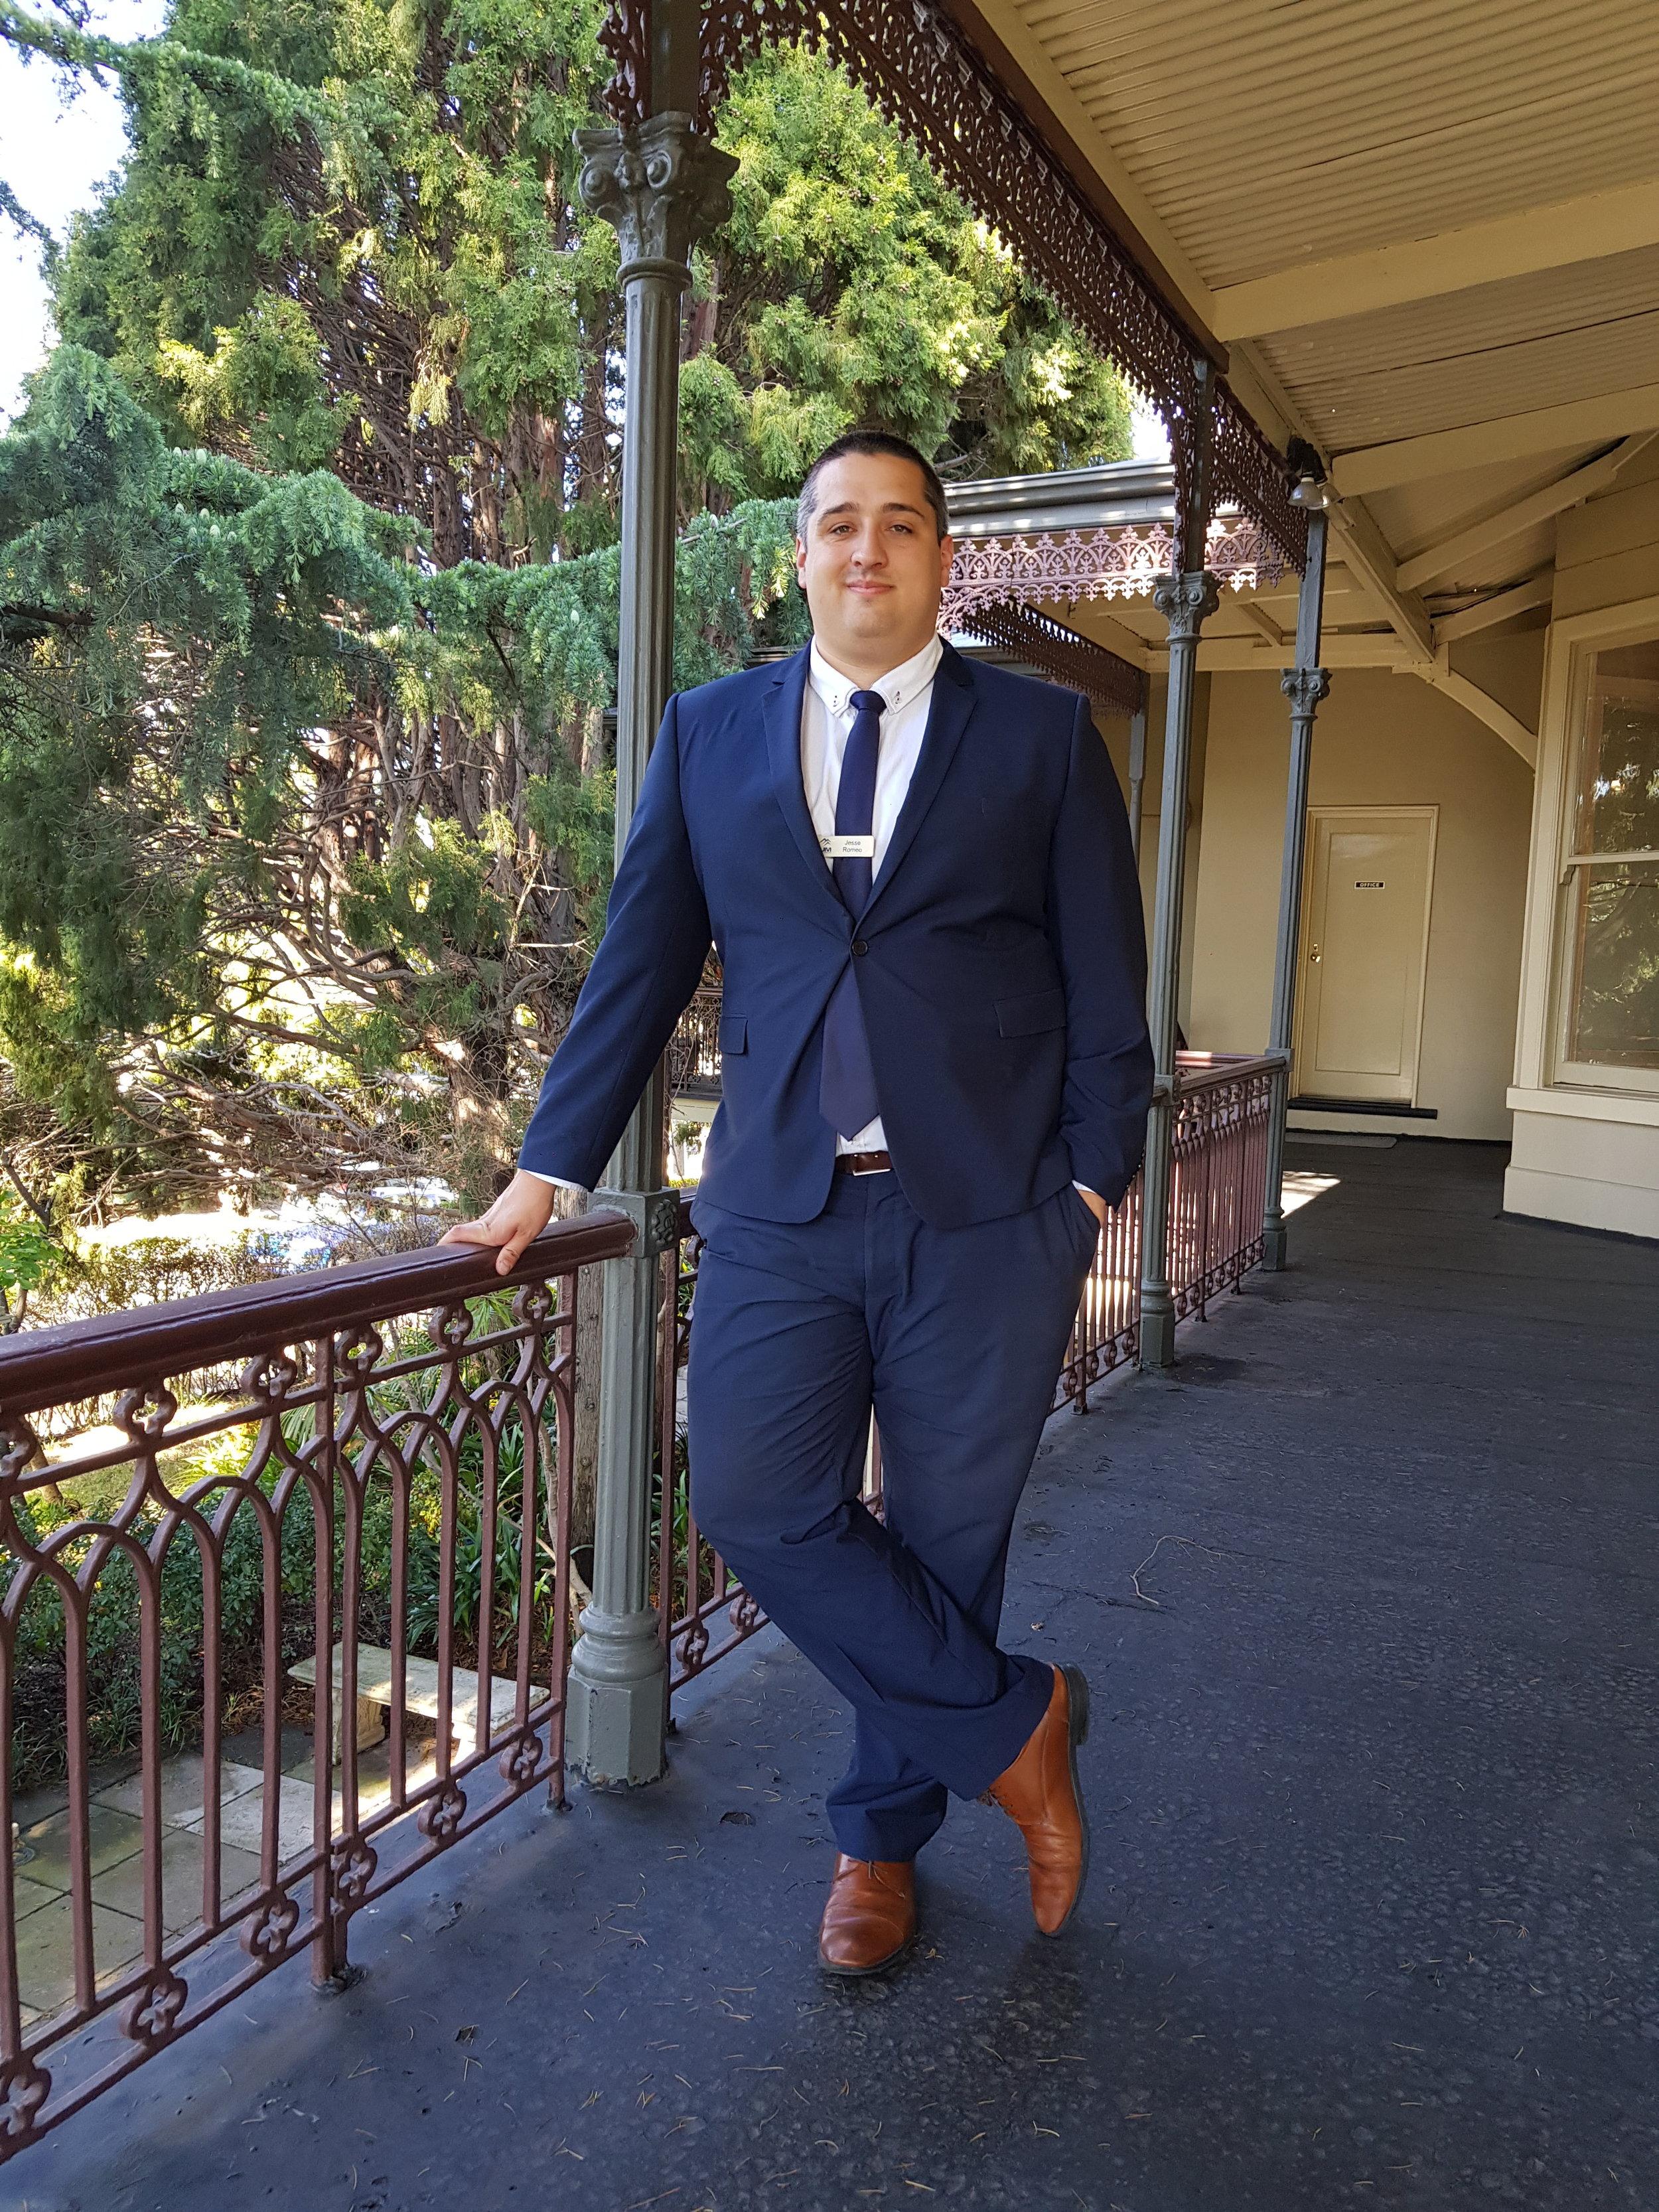 Jesse Romeo - Adviser  EMAIL: j.romeo@ejm.com.au  MOBILE: 0433 553 024